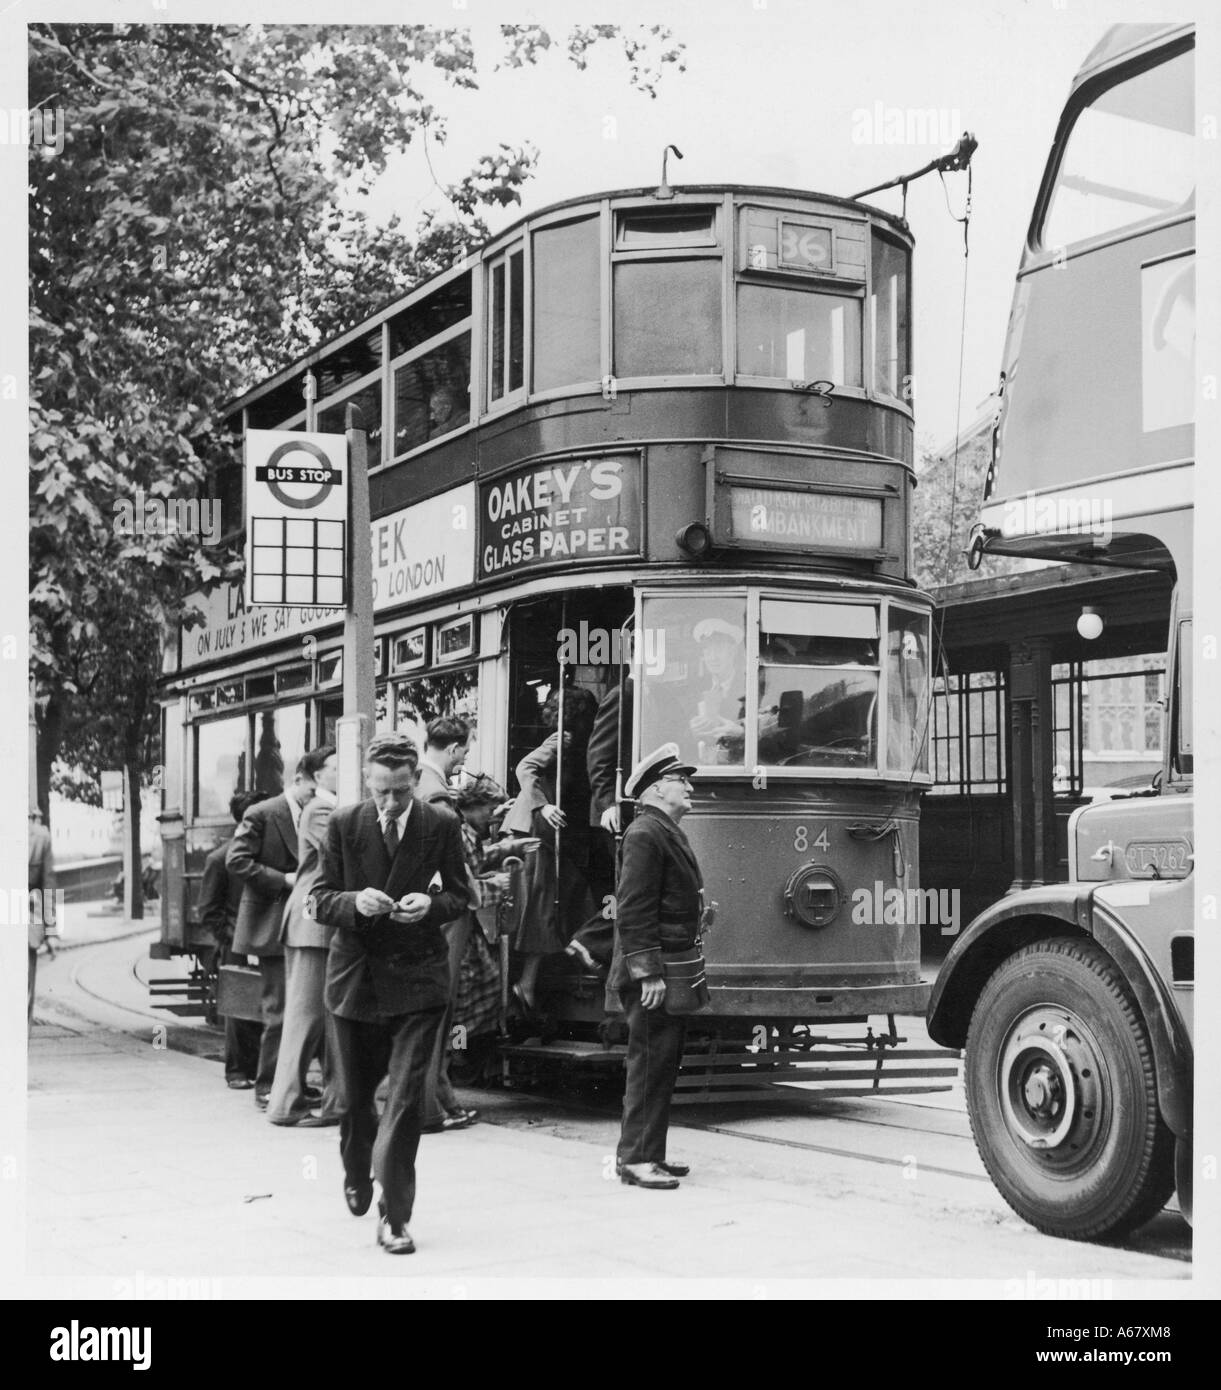 London Tram Stock Photos Amp London Tram Stock Images Alamy